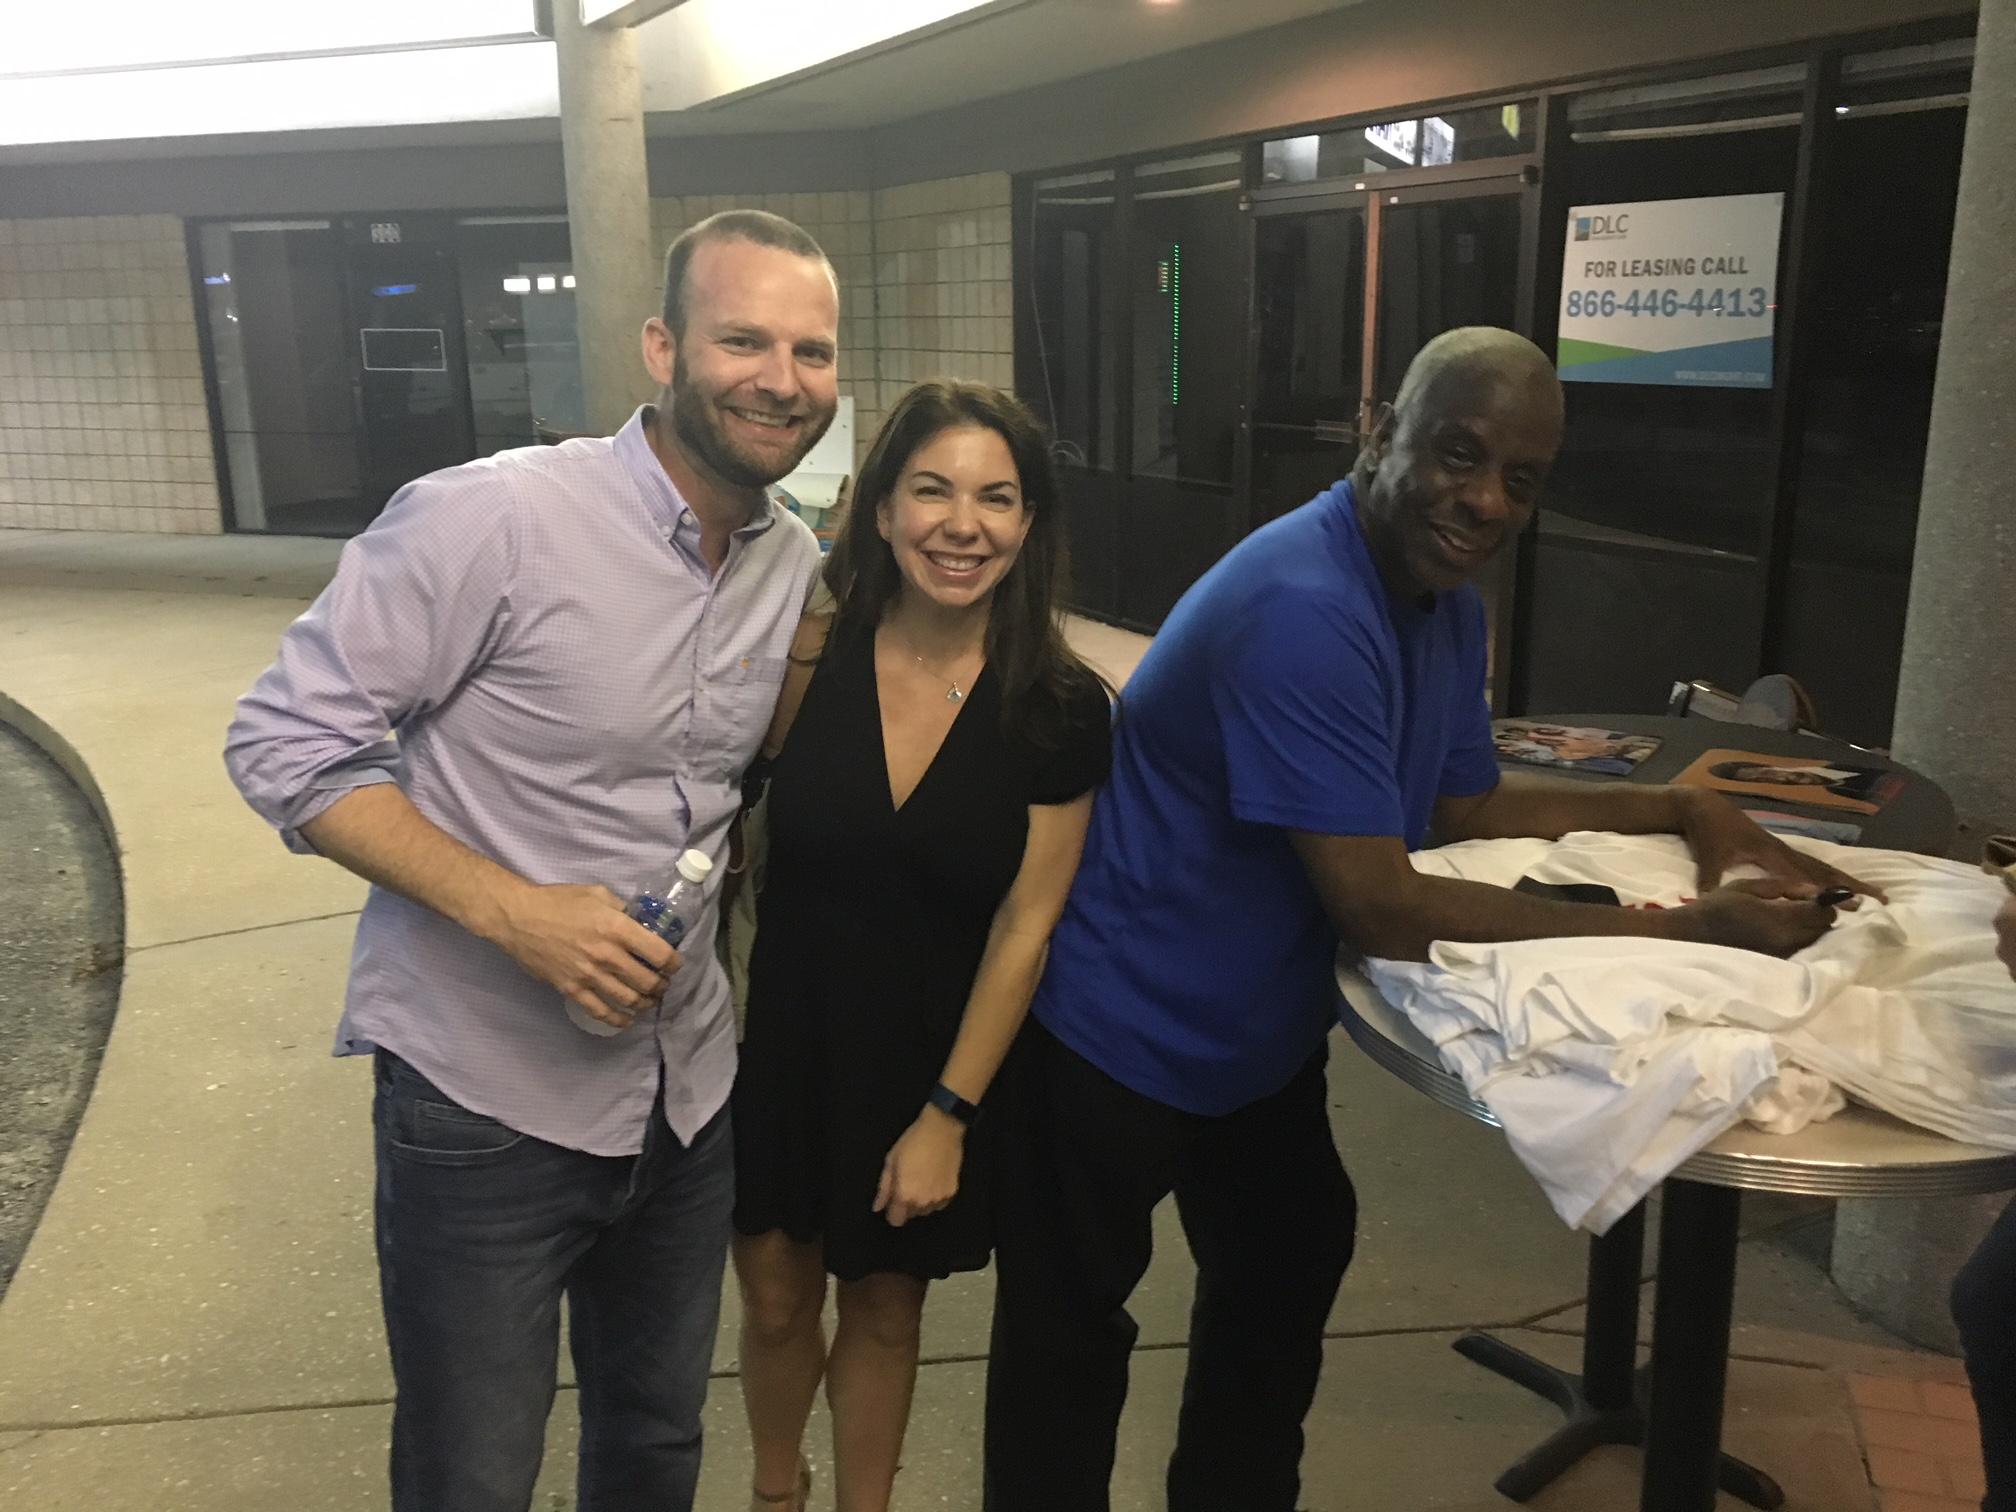 Meet Dustin Rinaldi Naples Fl Swfl Community Events